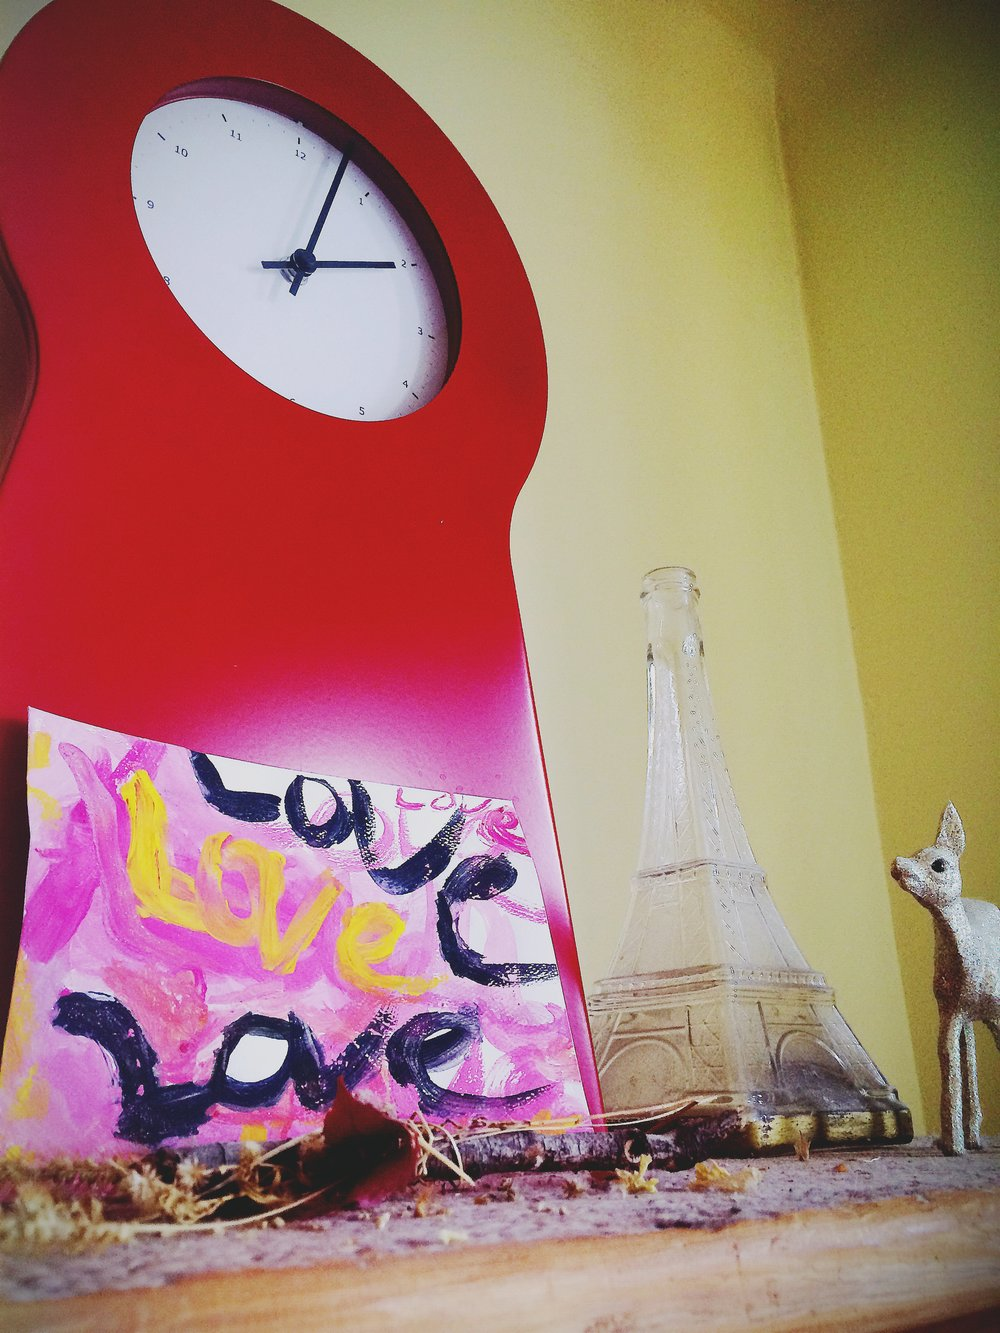 Lovehomealtarclock.jpeg